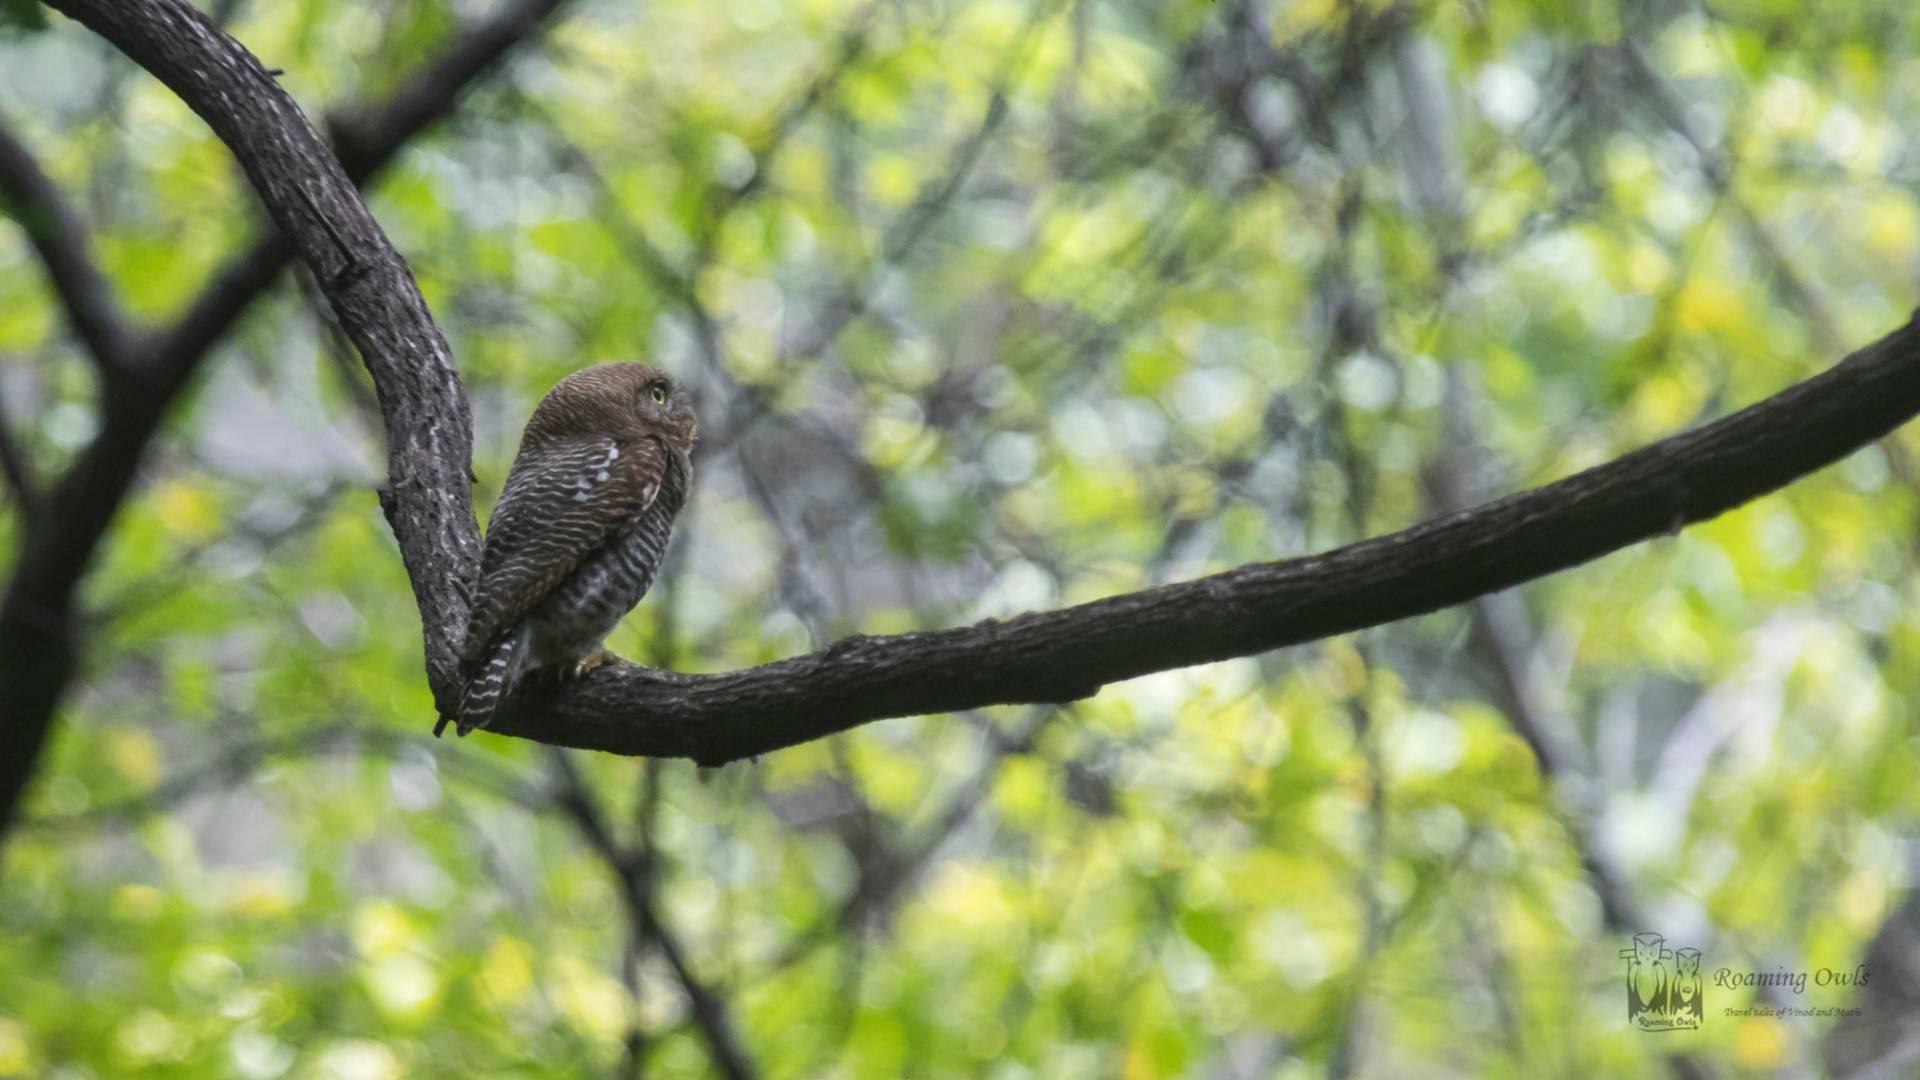 The jungle owlet, barred jungle owlet, (Glaucidium radiatum)